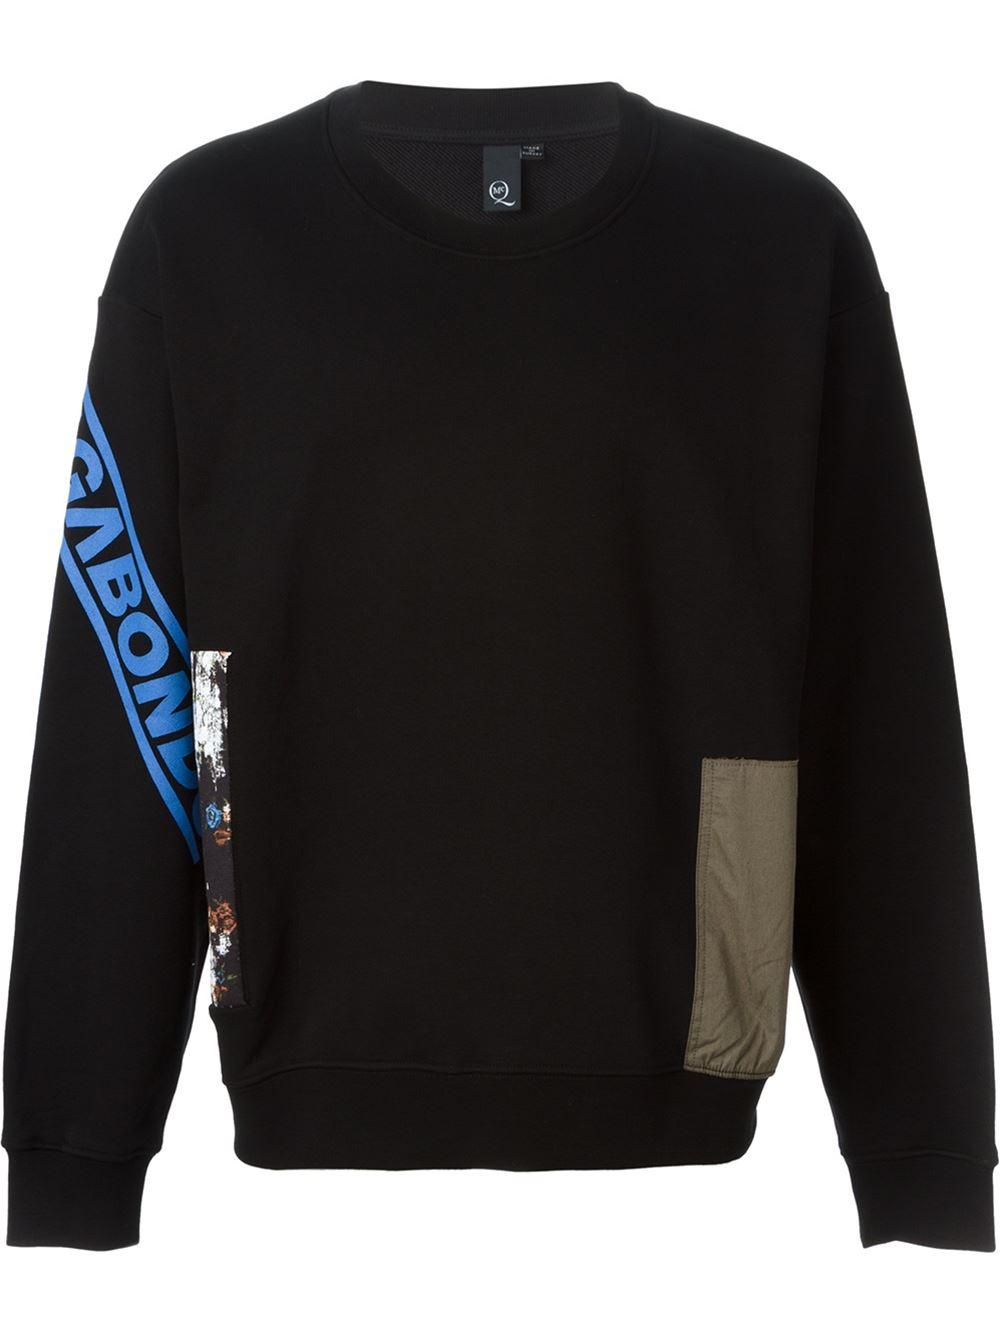 mcq alexander mcqueen patchwork sweatshirt in black for men lyst. Black Bedroom Furniture Sets. Home Design Ideas